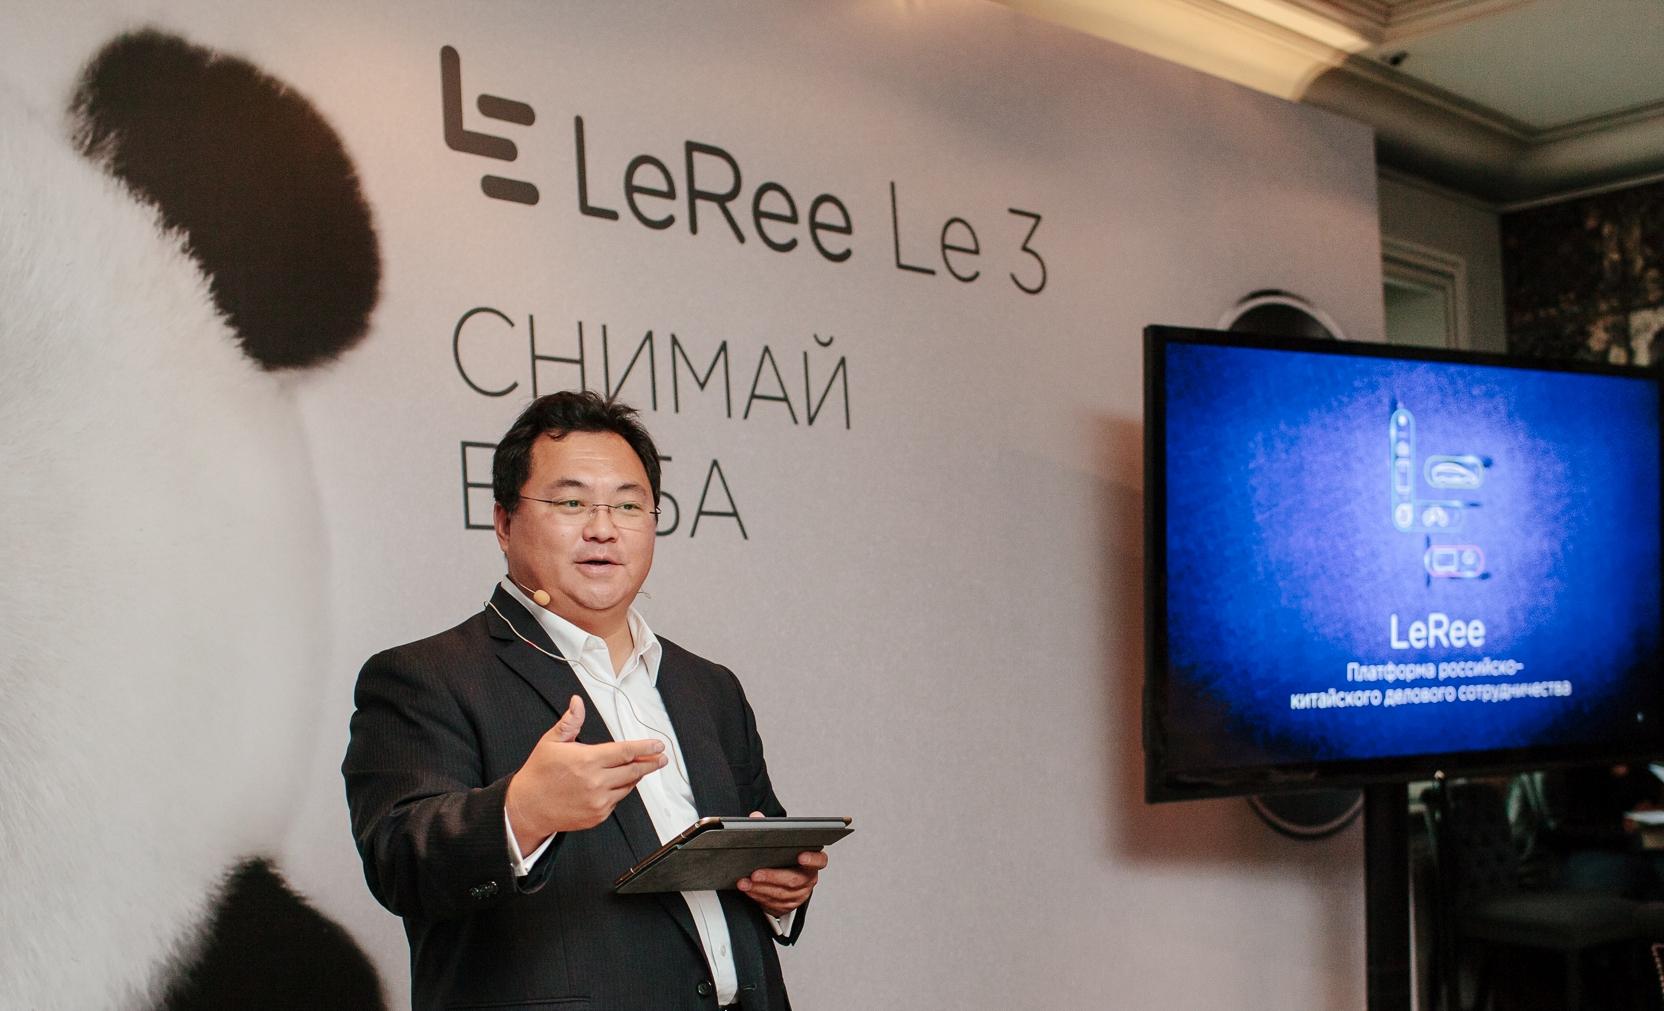 Объявлена русская цена LeRee Le3 сдвойной камерой